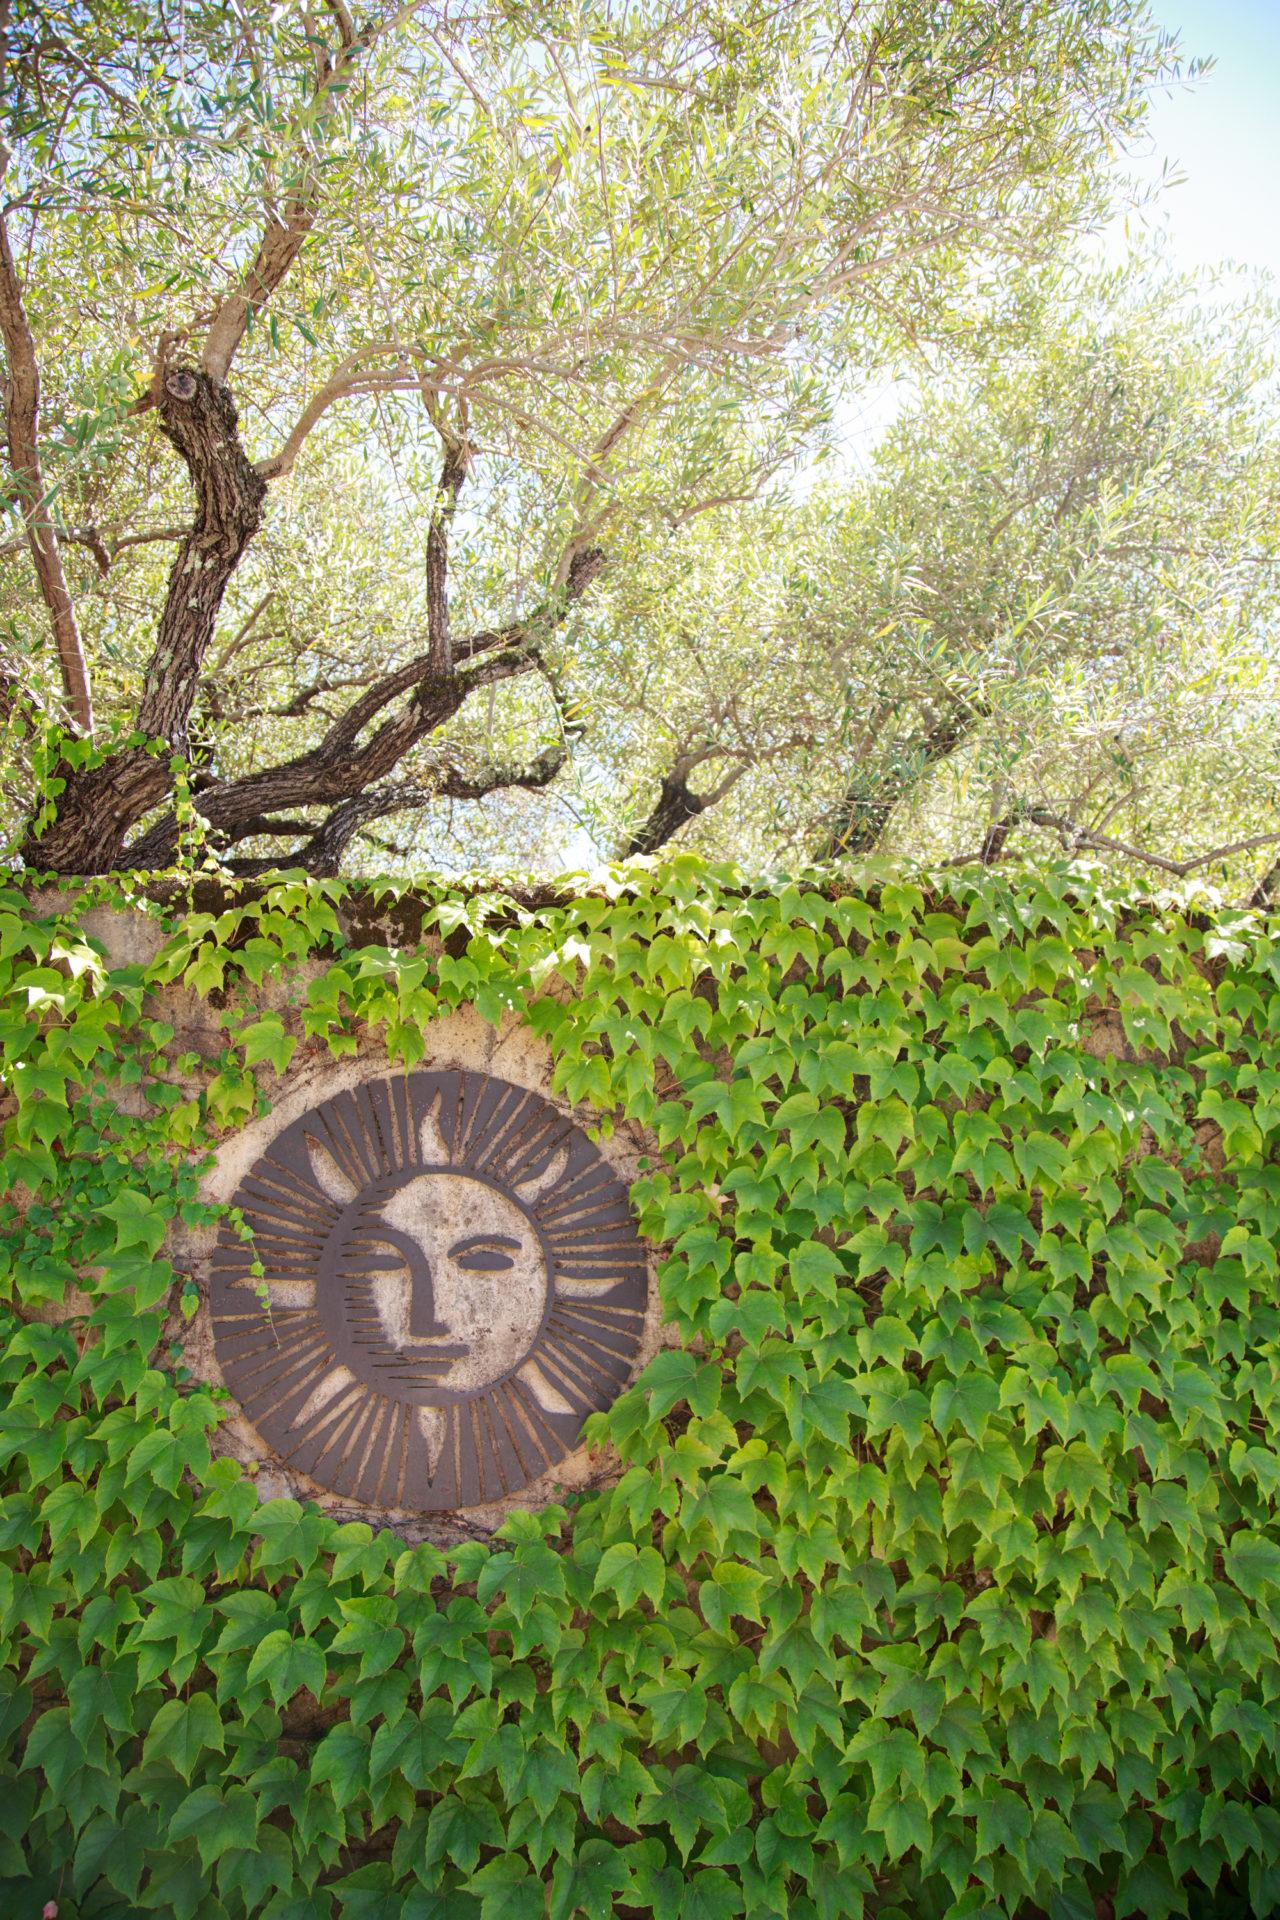 Auberge du Soleil ivy and sun